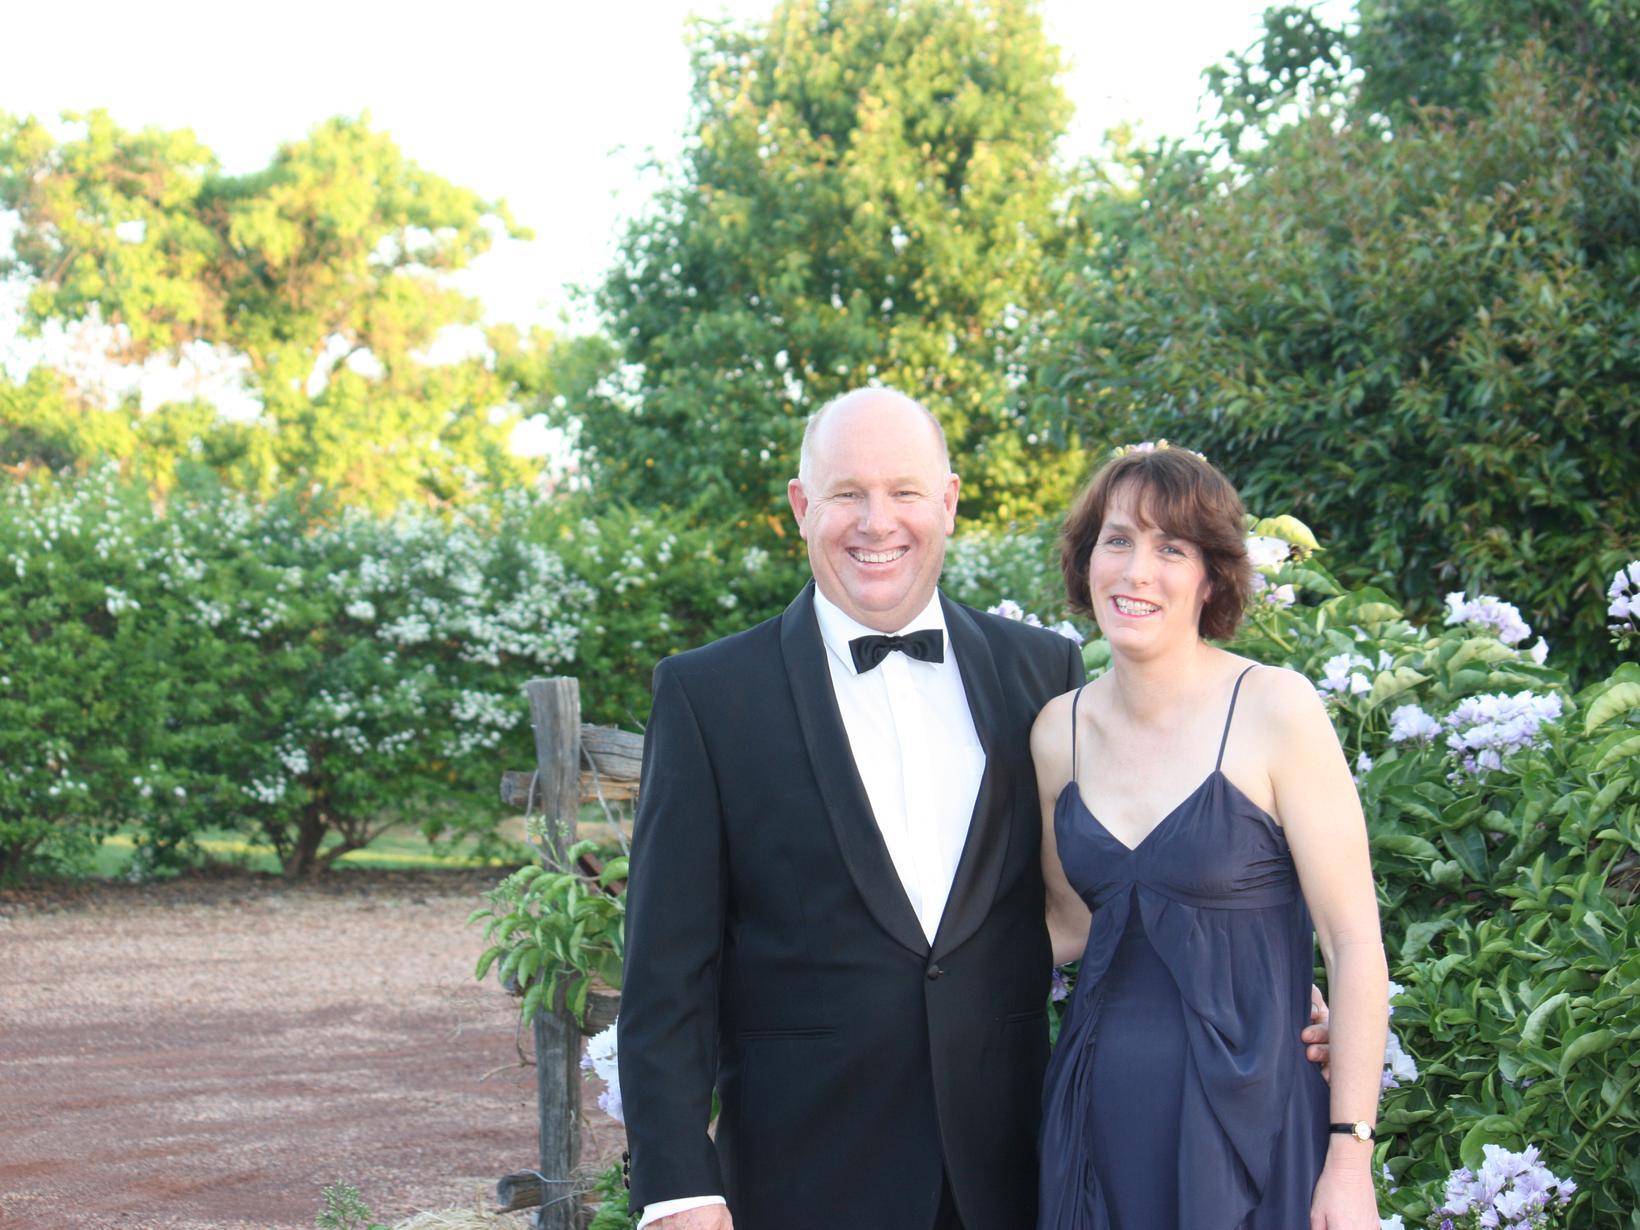 Judith & Simon from Saint George, Queensland, Australia